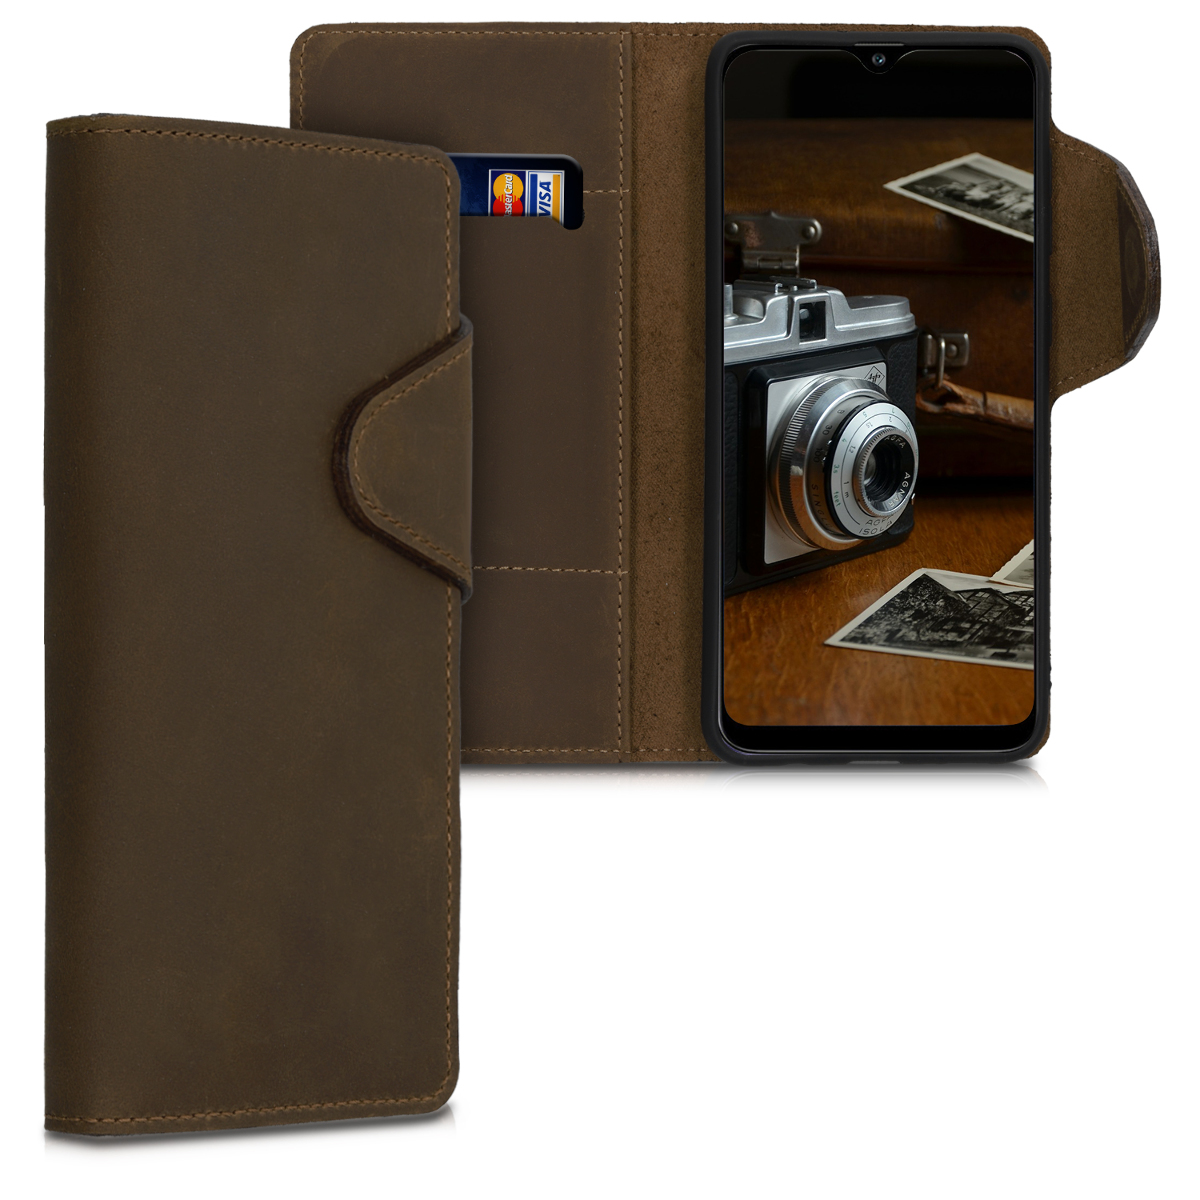 Kalibri Δερμάτινη Suede Θήκη - Πορτοφόλι Samsung Galaxy A30s - Brown (50201.05)